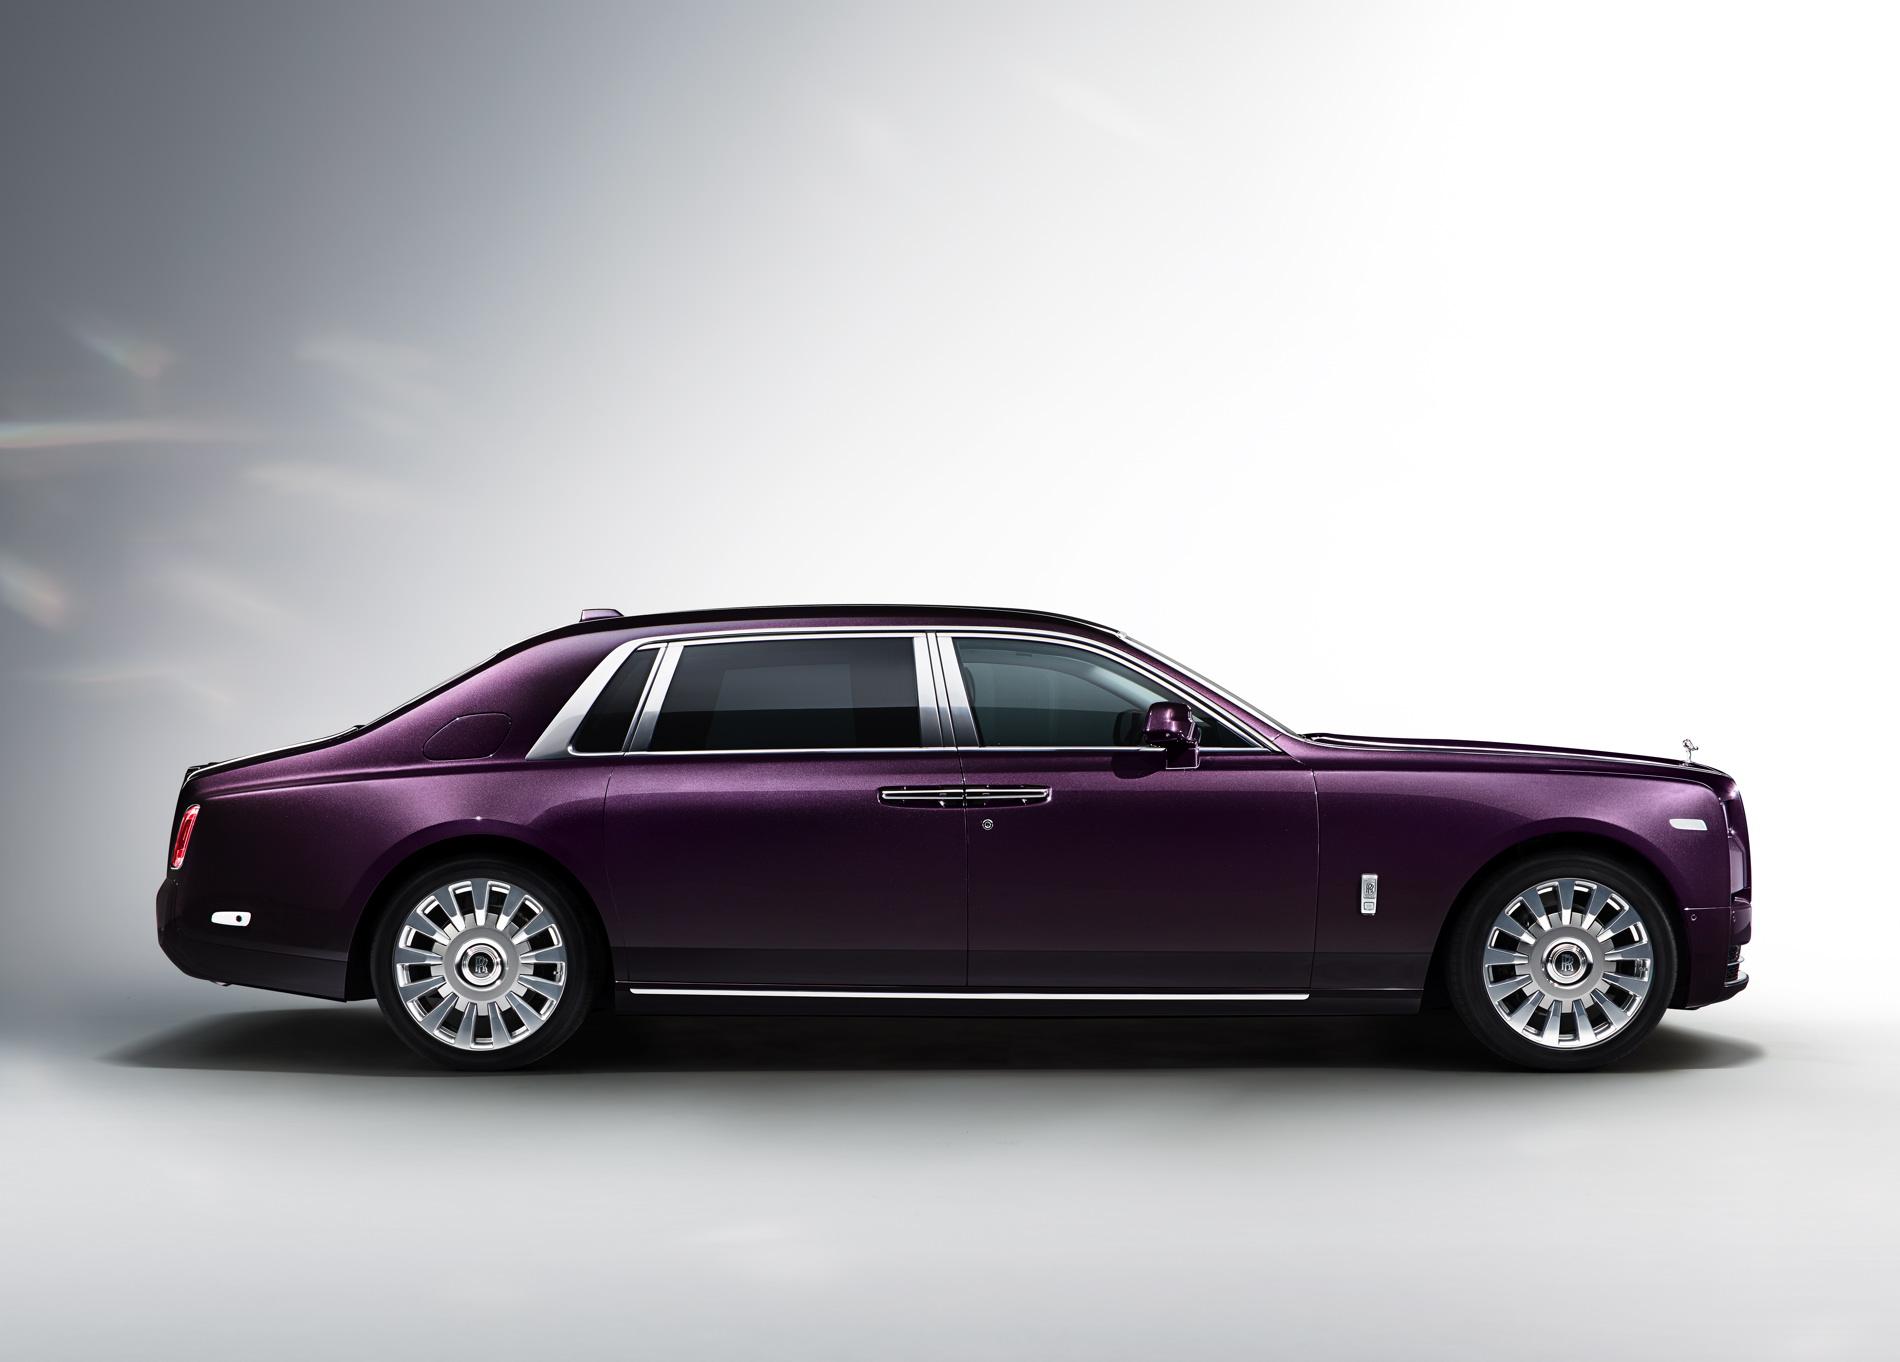 New Rolls Royce Phantom Extended Wheelbase Photo Gallery